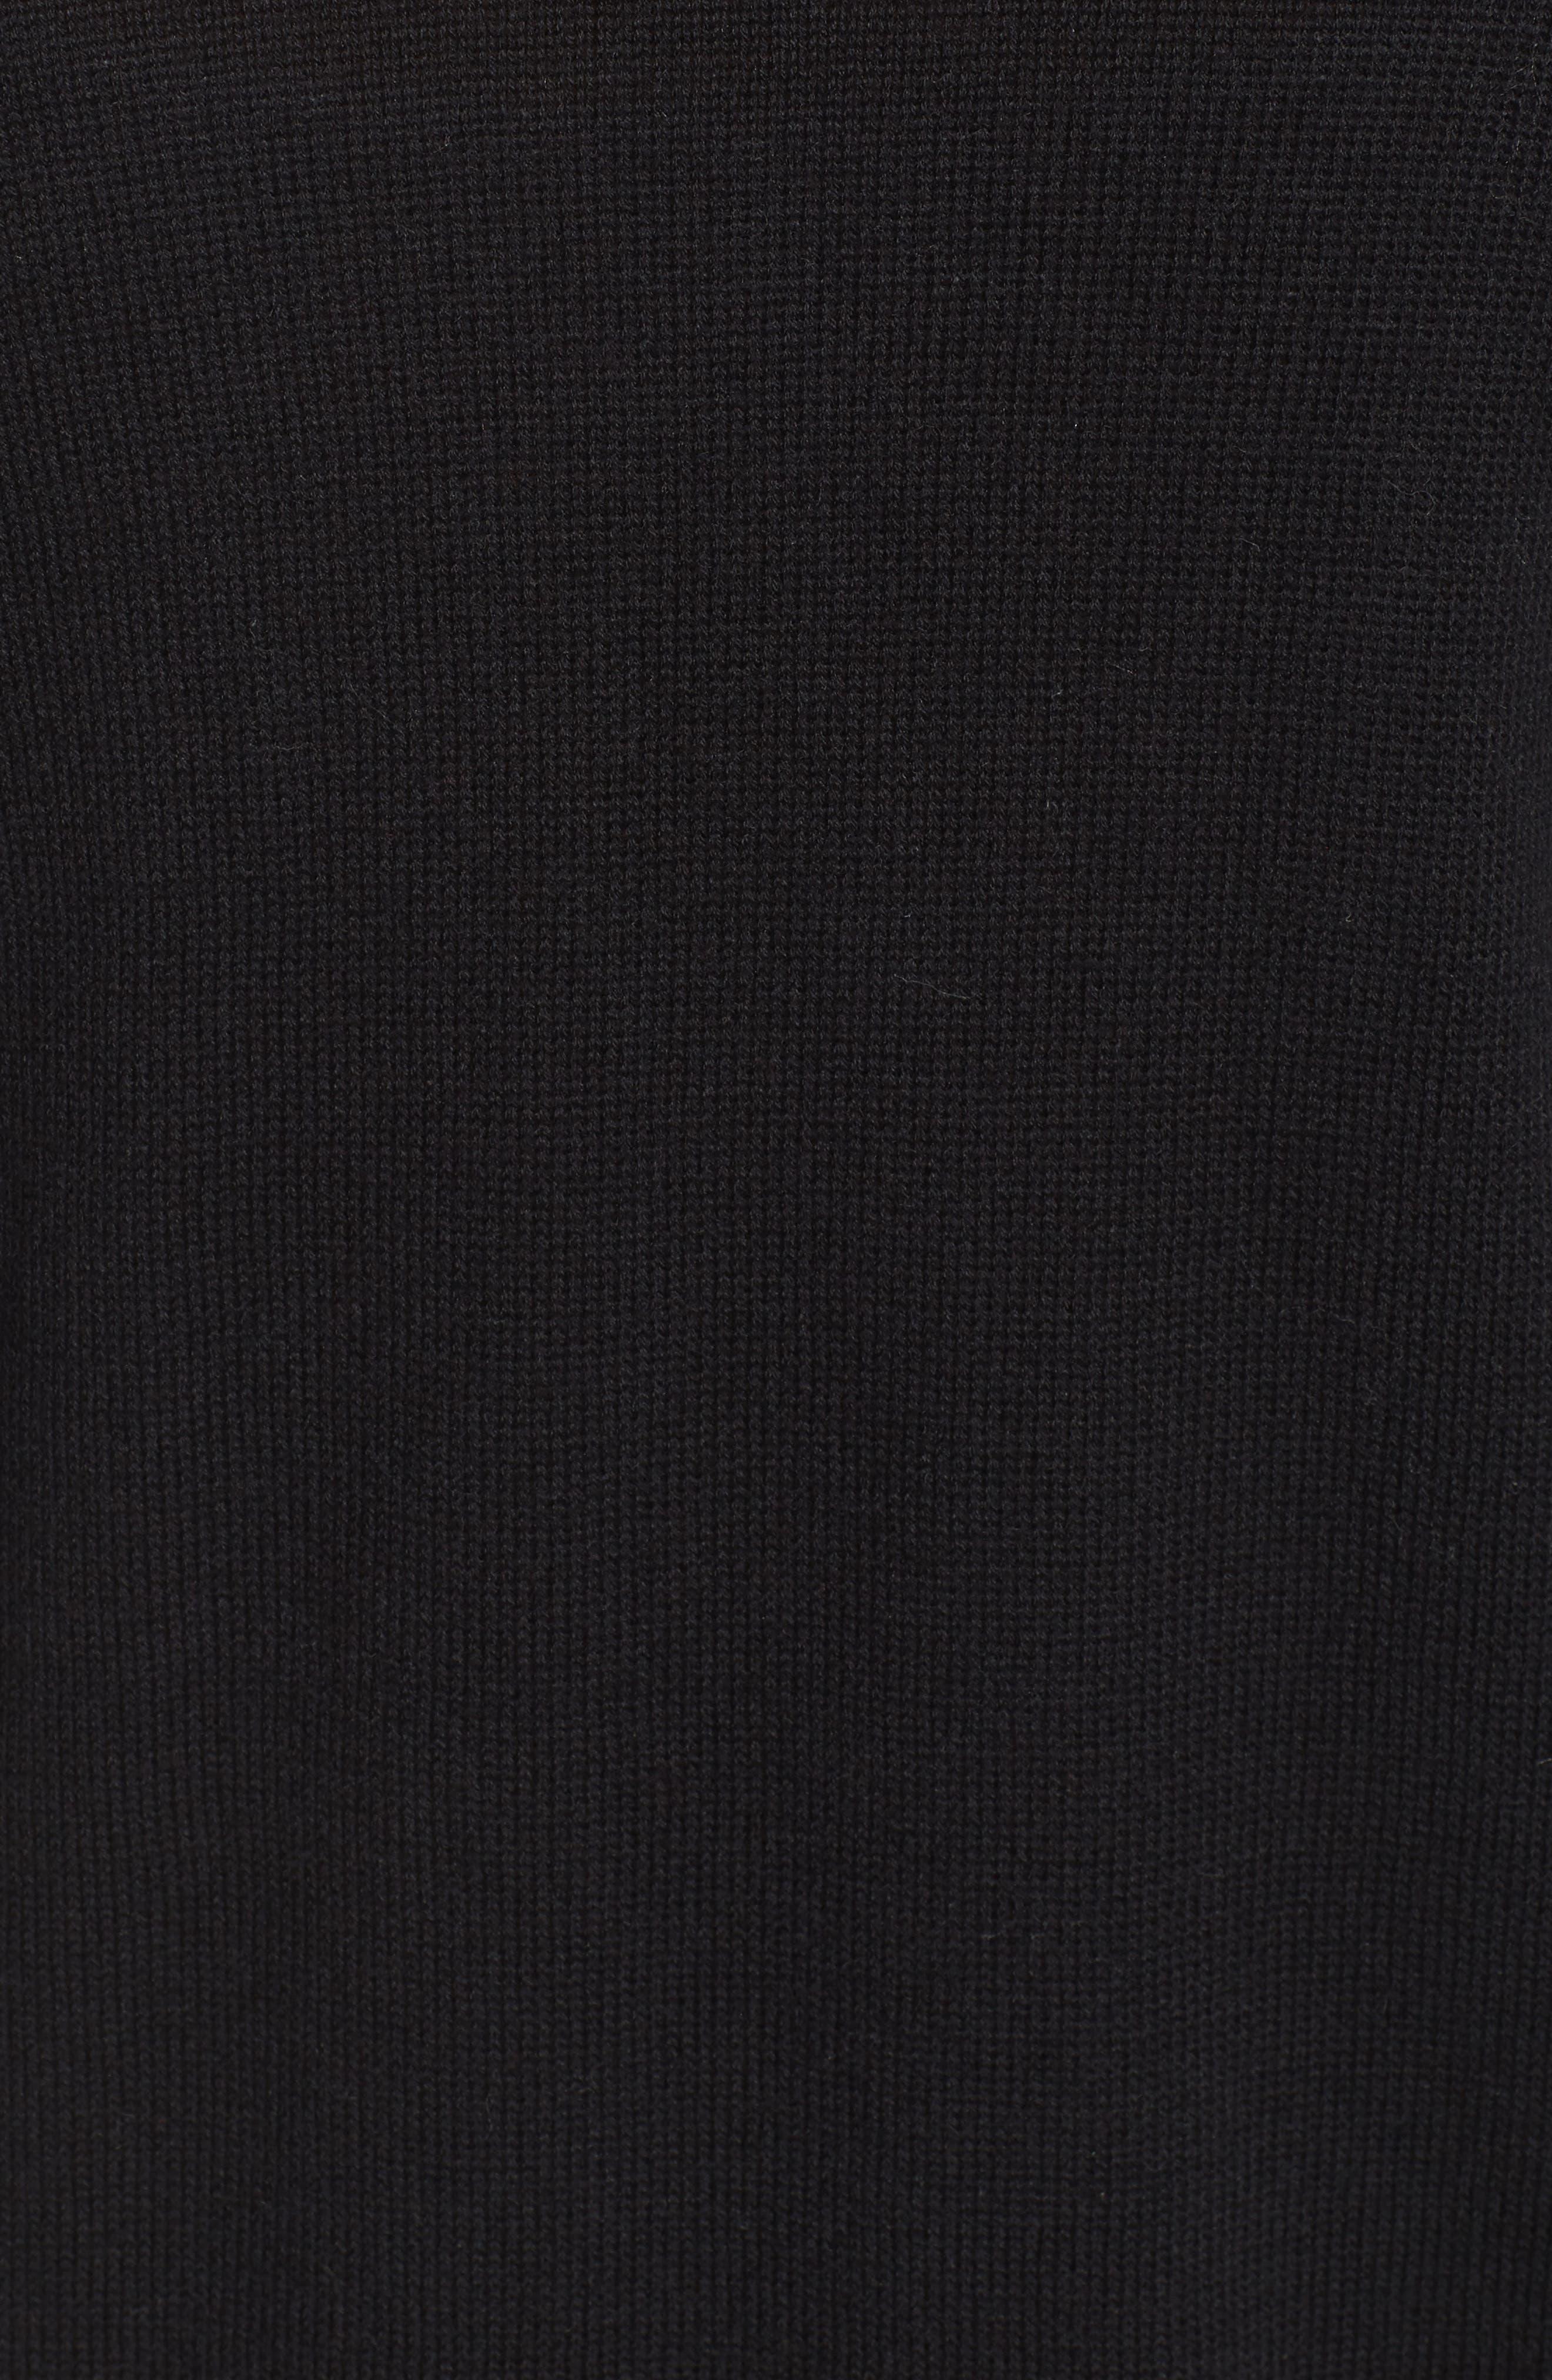 Ruffle Sleeve Cardigan,                             Alternate thumbnail 5, color,                             001